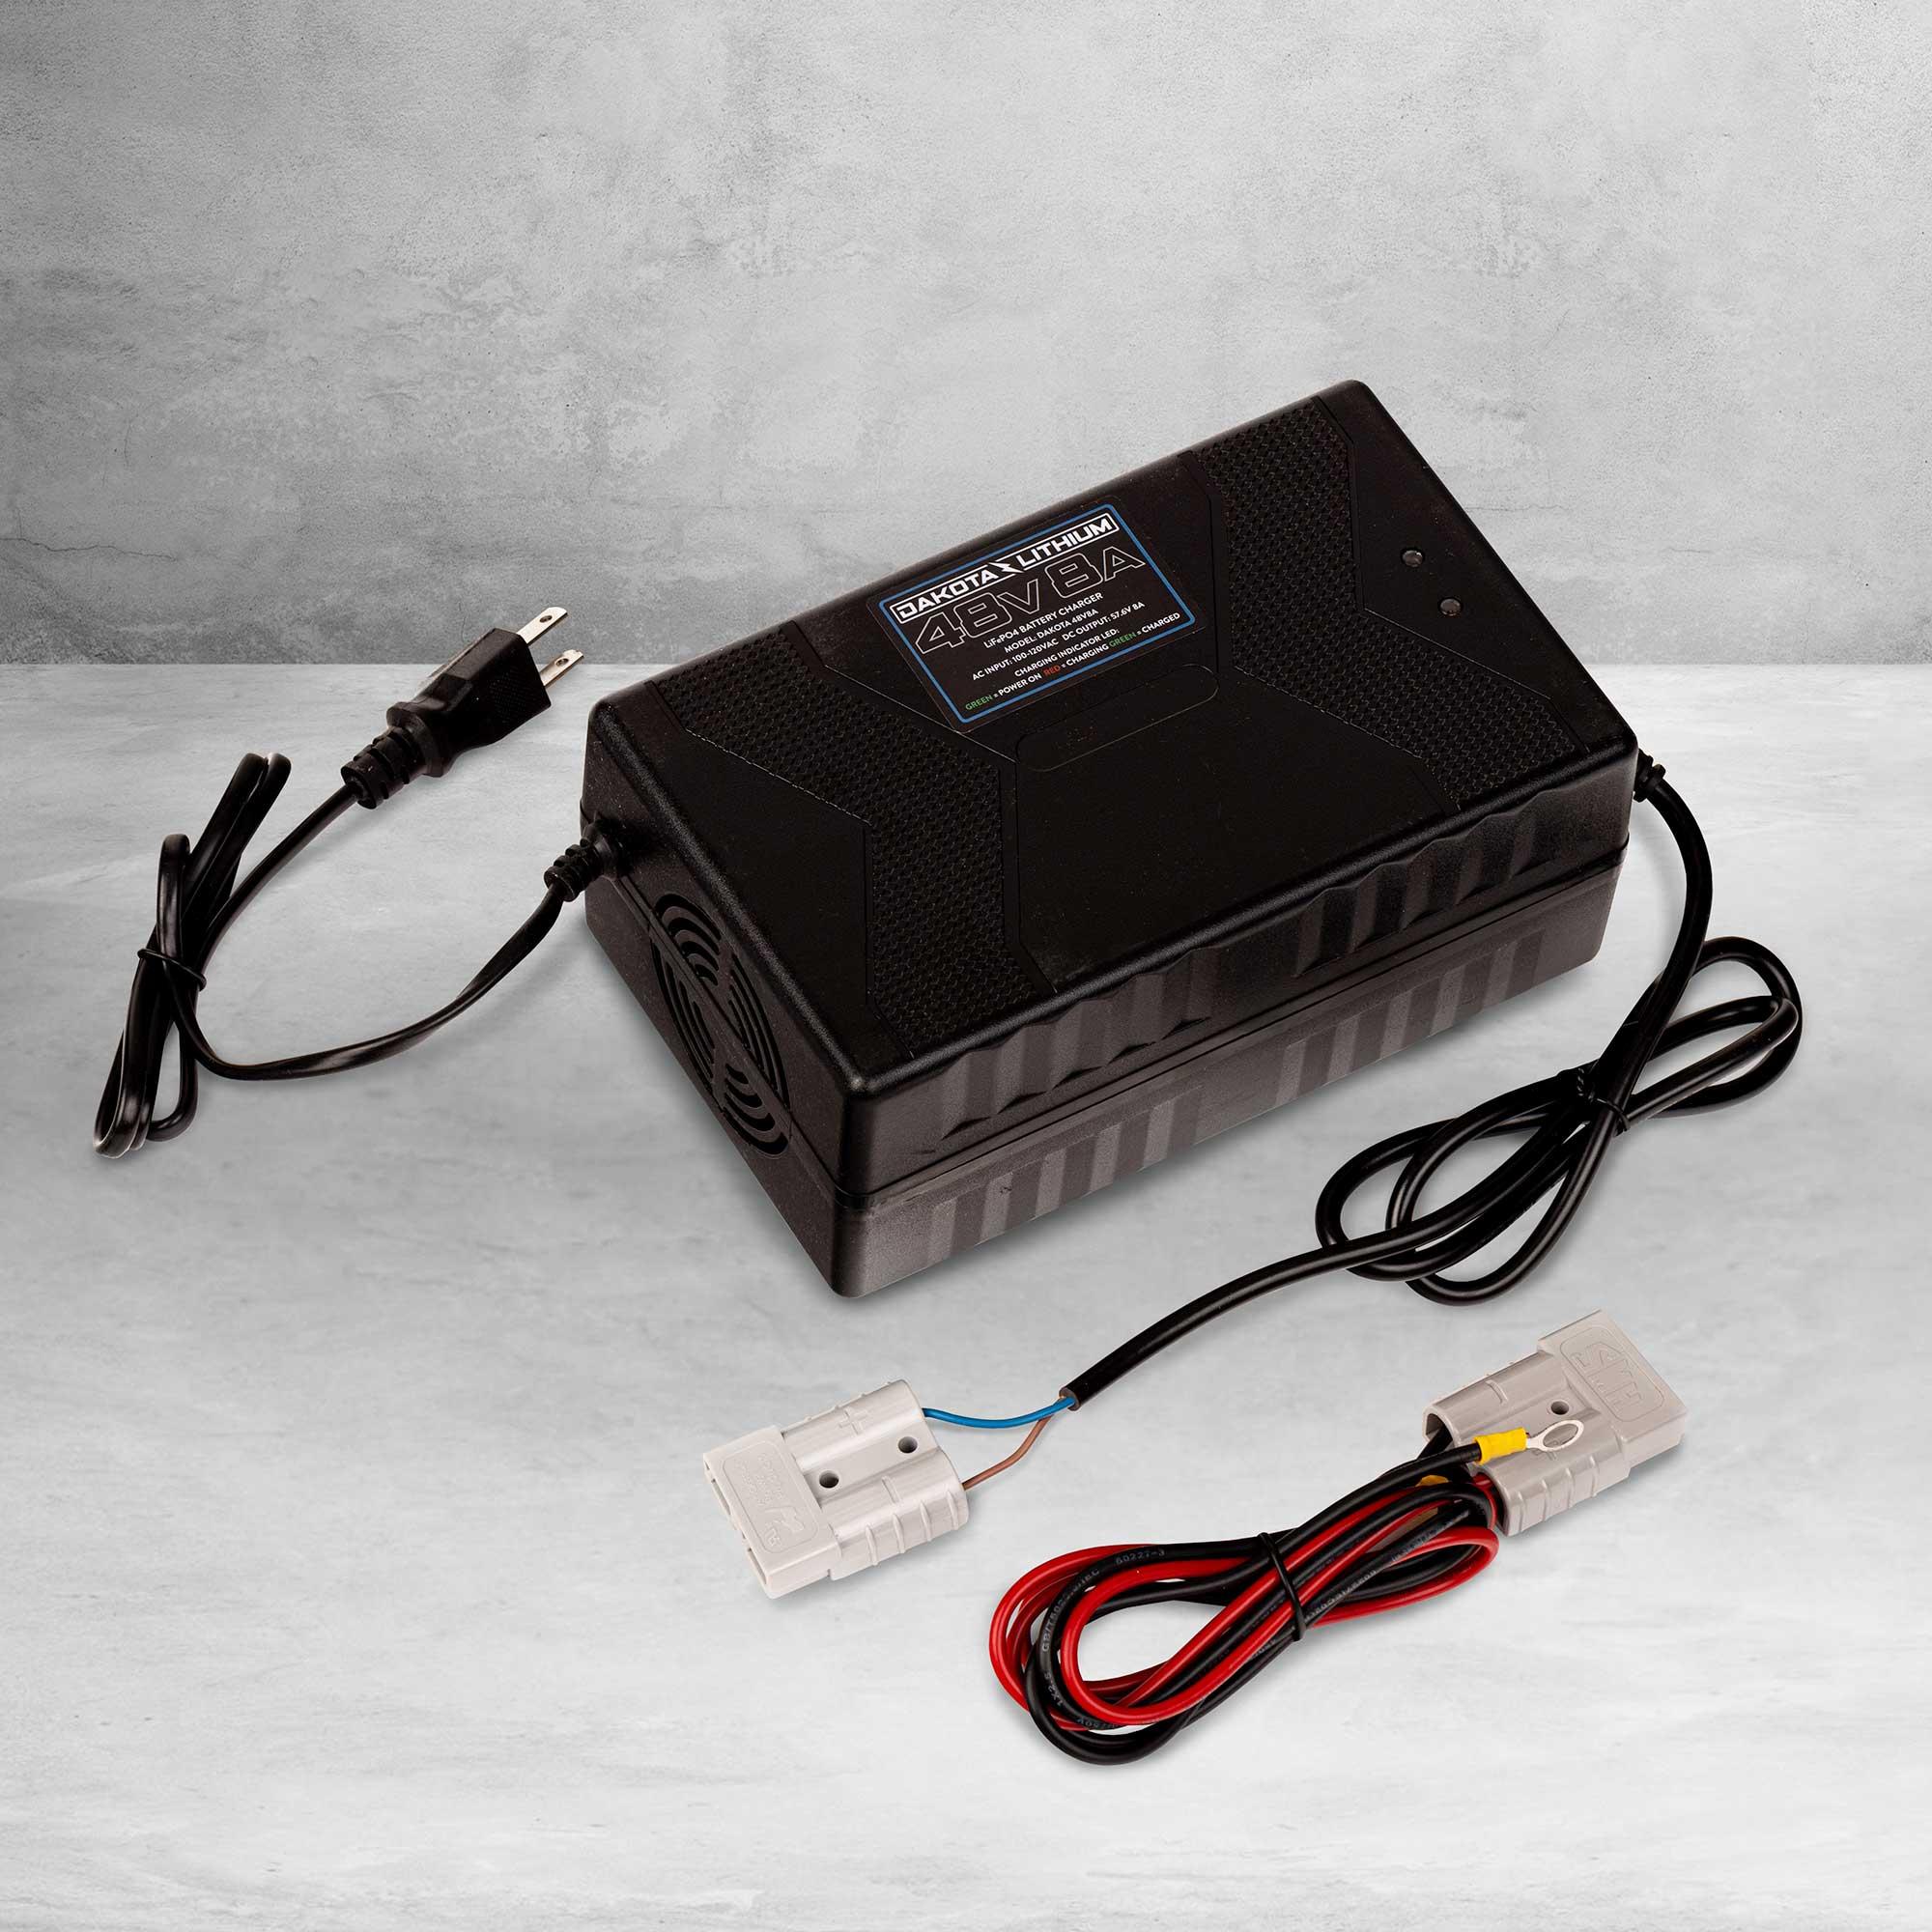 48v 8 Amp Dakota Lithium LiFePO4 Battery Charger